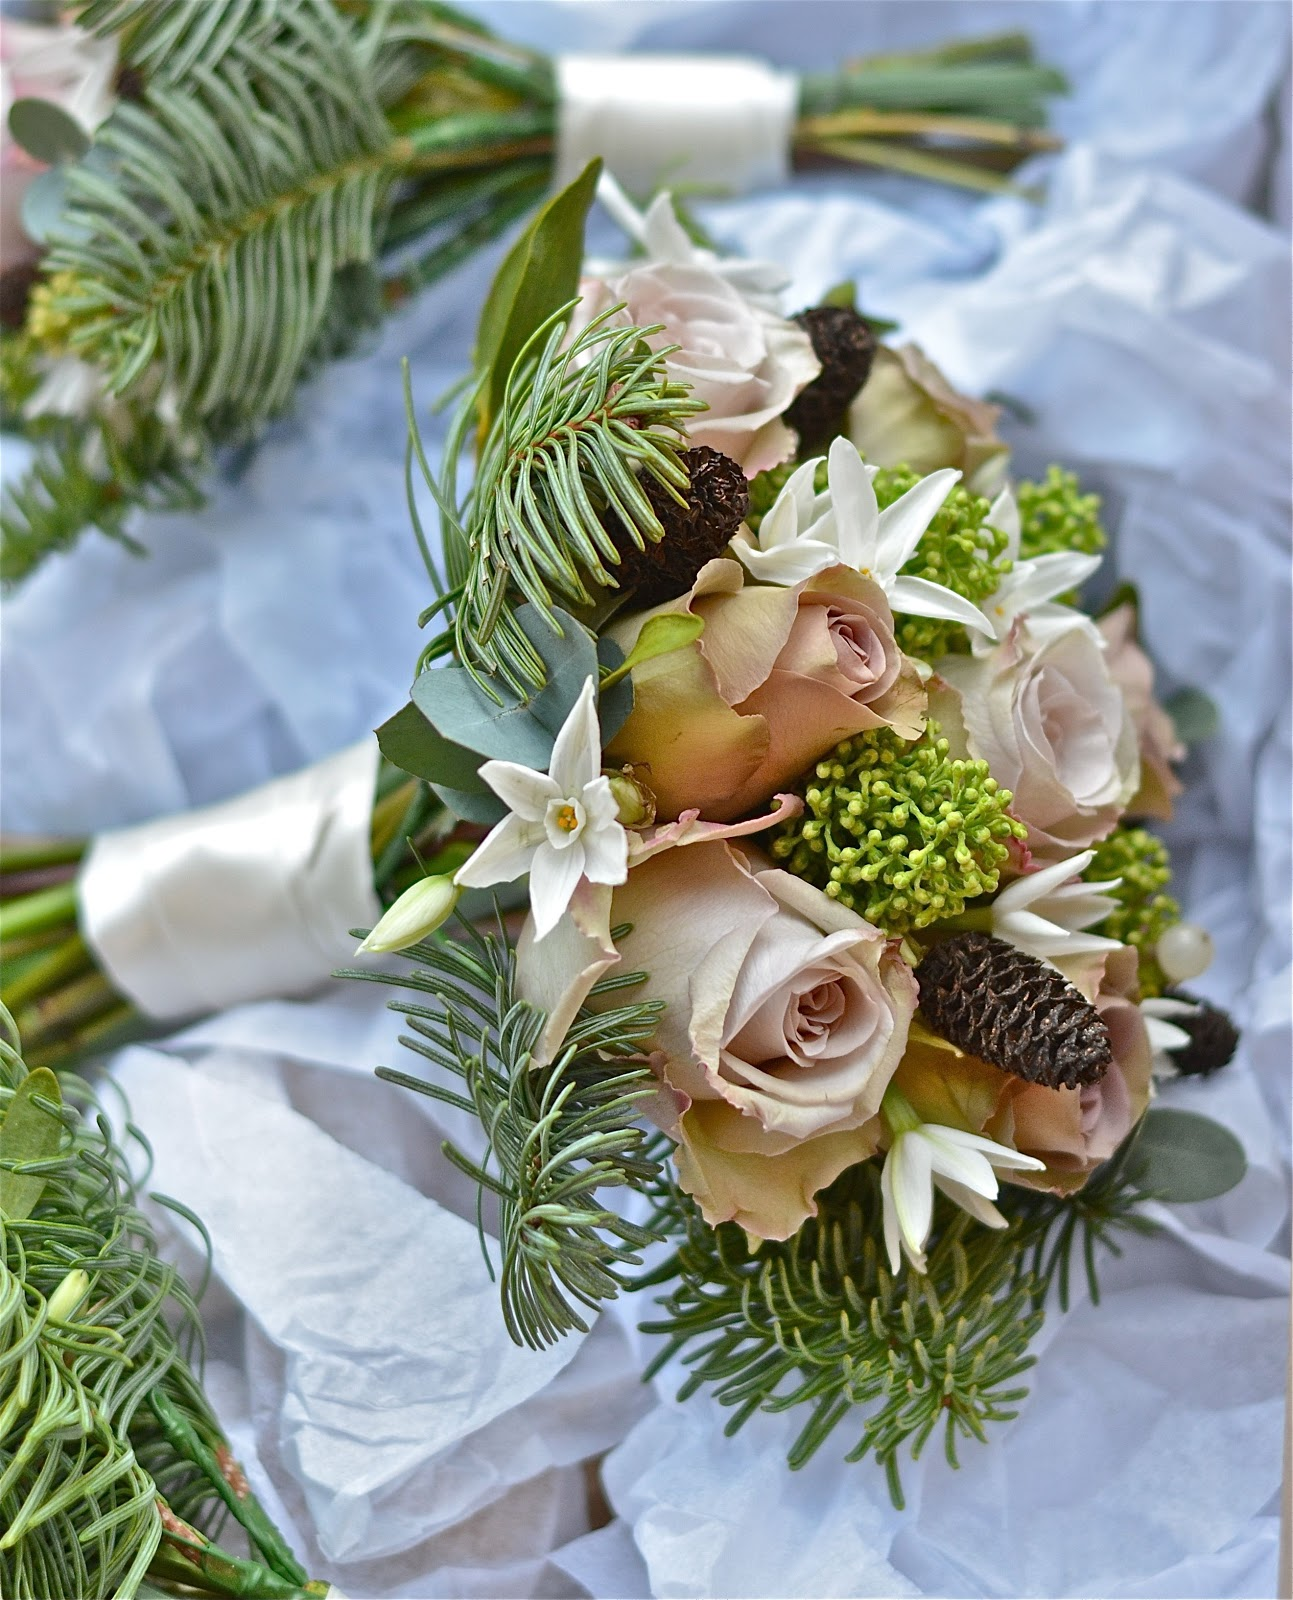 Wedding Bouquets For December : Wedding flowers jen s december